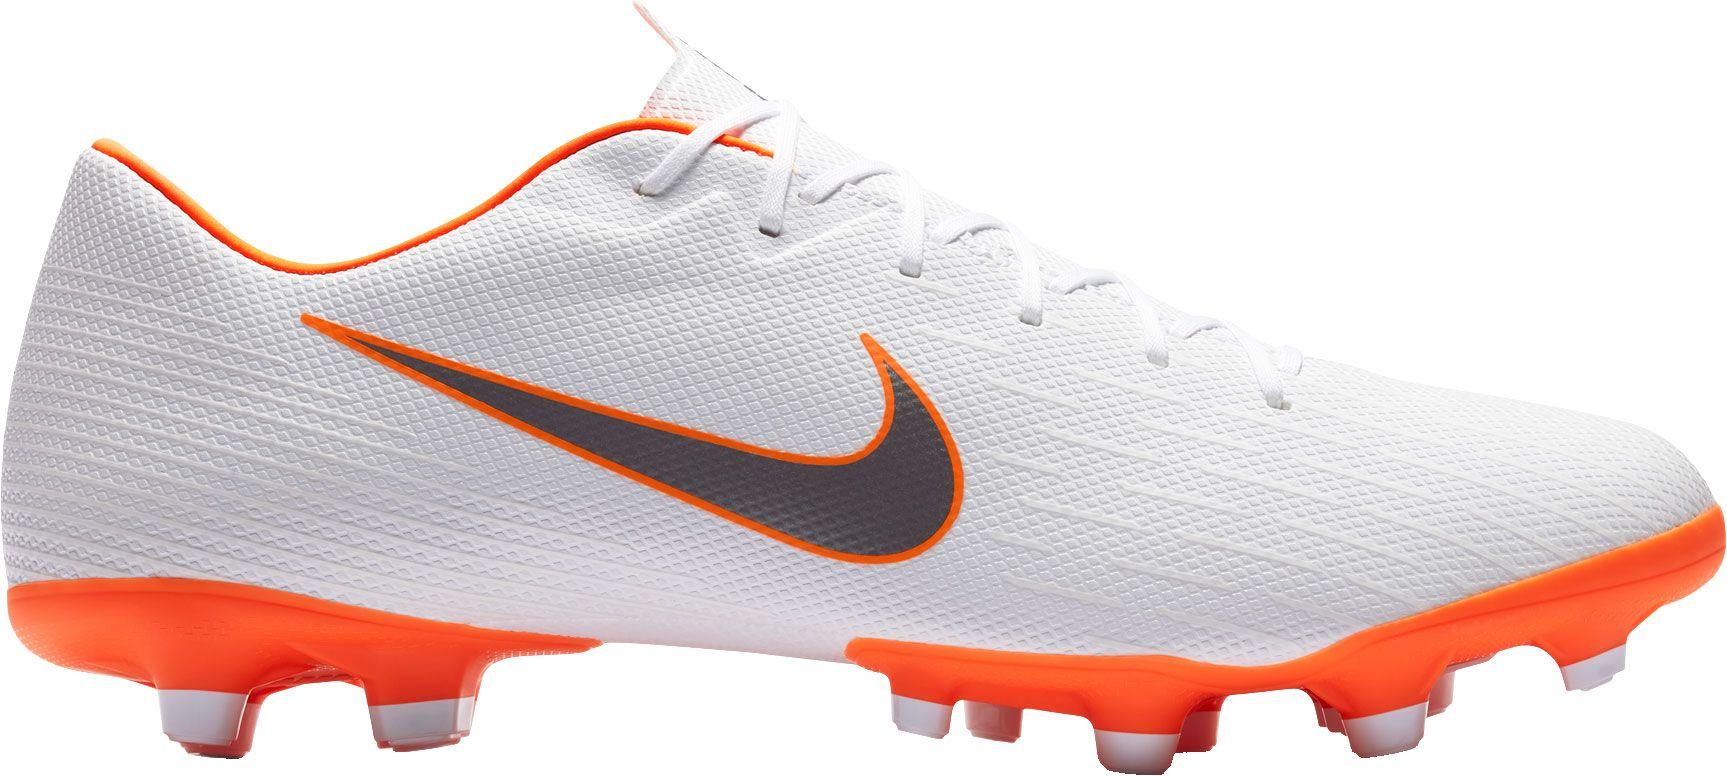 82038ca2d8d8ba Nike Mercurial Vapor 12 Academy MG Soccer Cleats